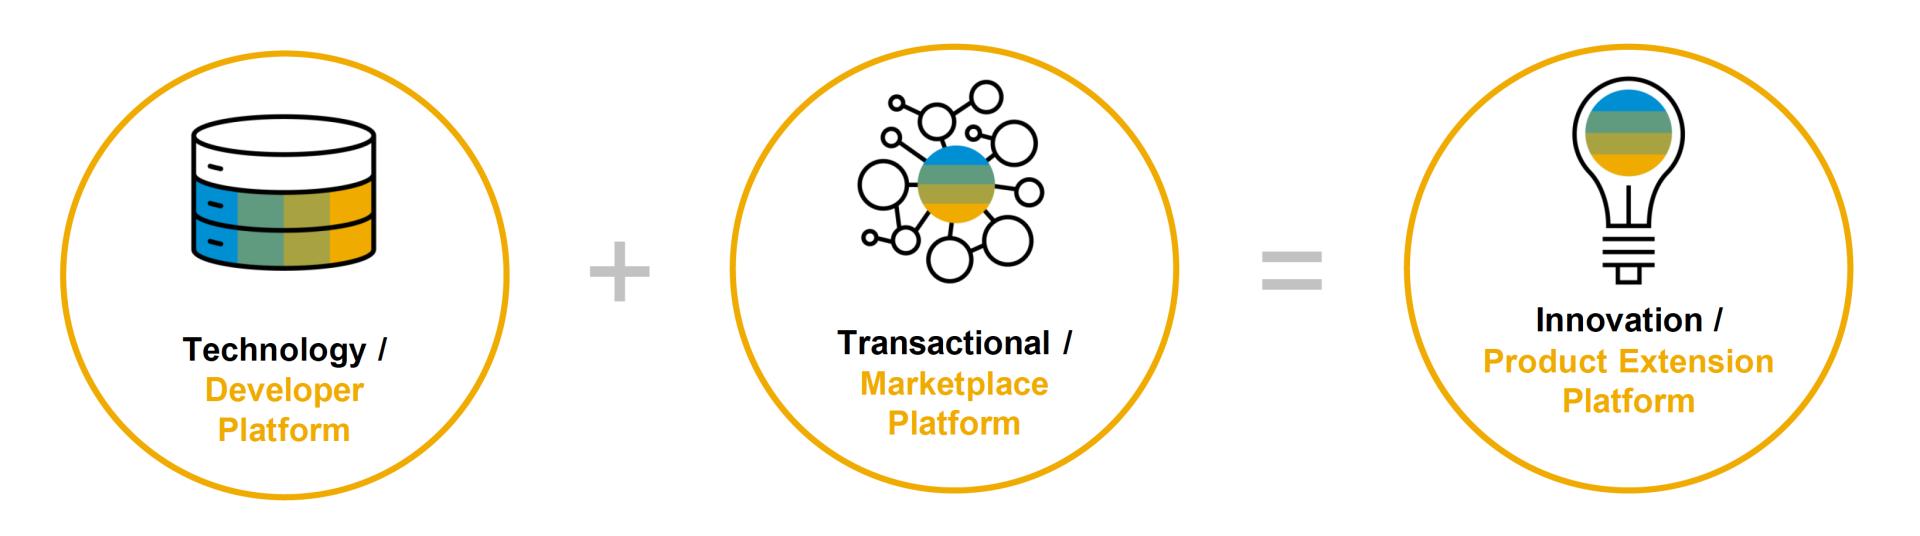 SAP Business Technology Platform Purpose